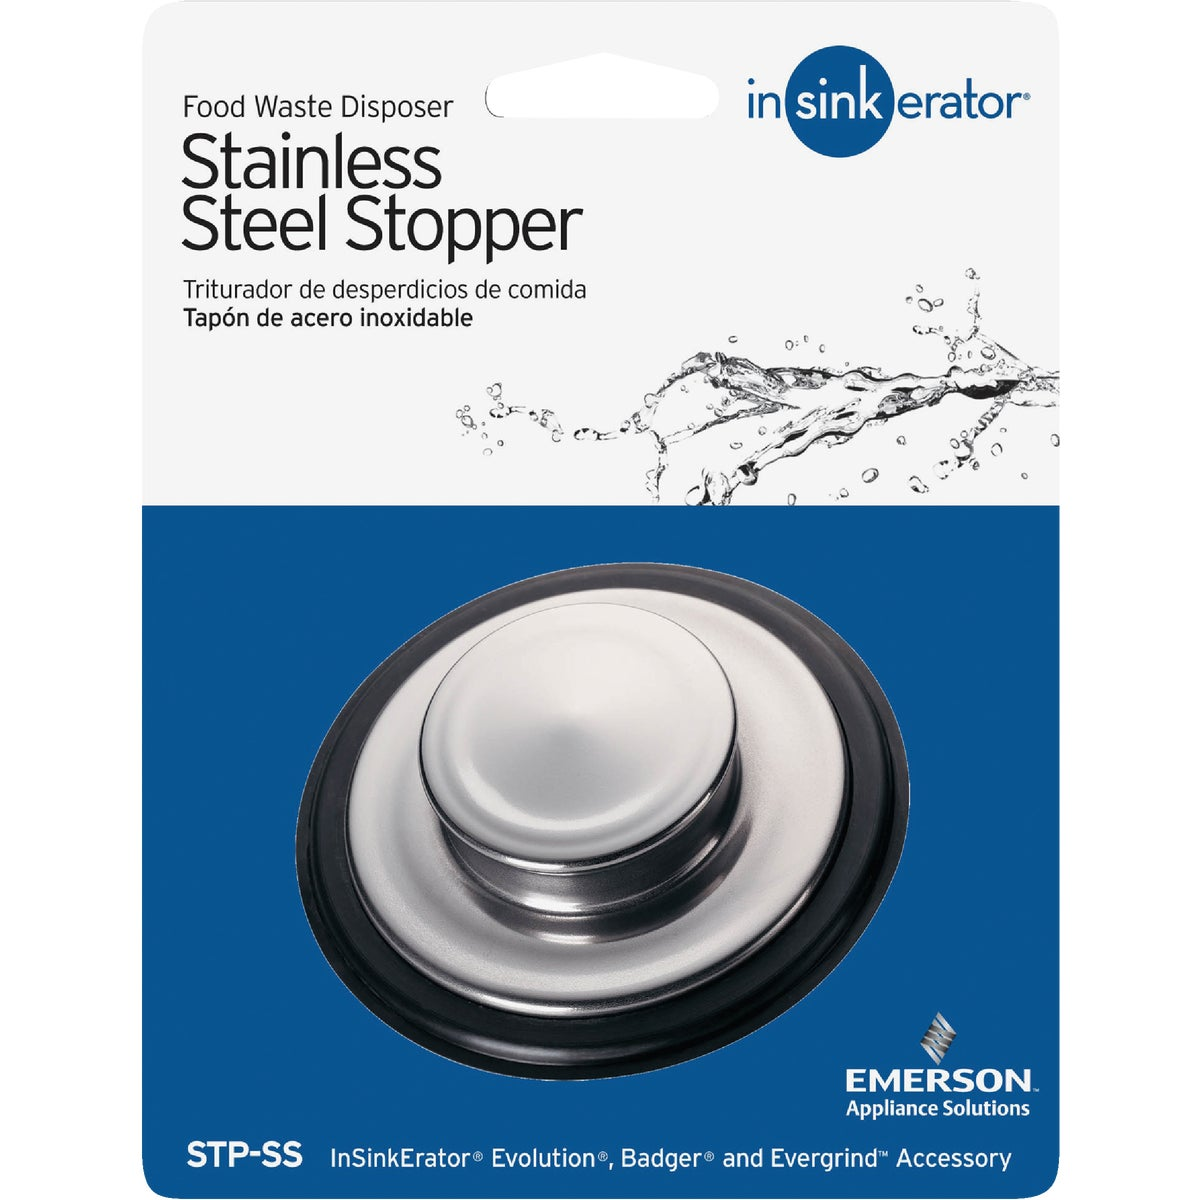 STAINLESS STEEL STOPPER - STP-SS by Insinkerator Evergrd